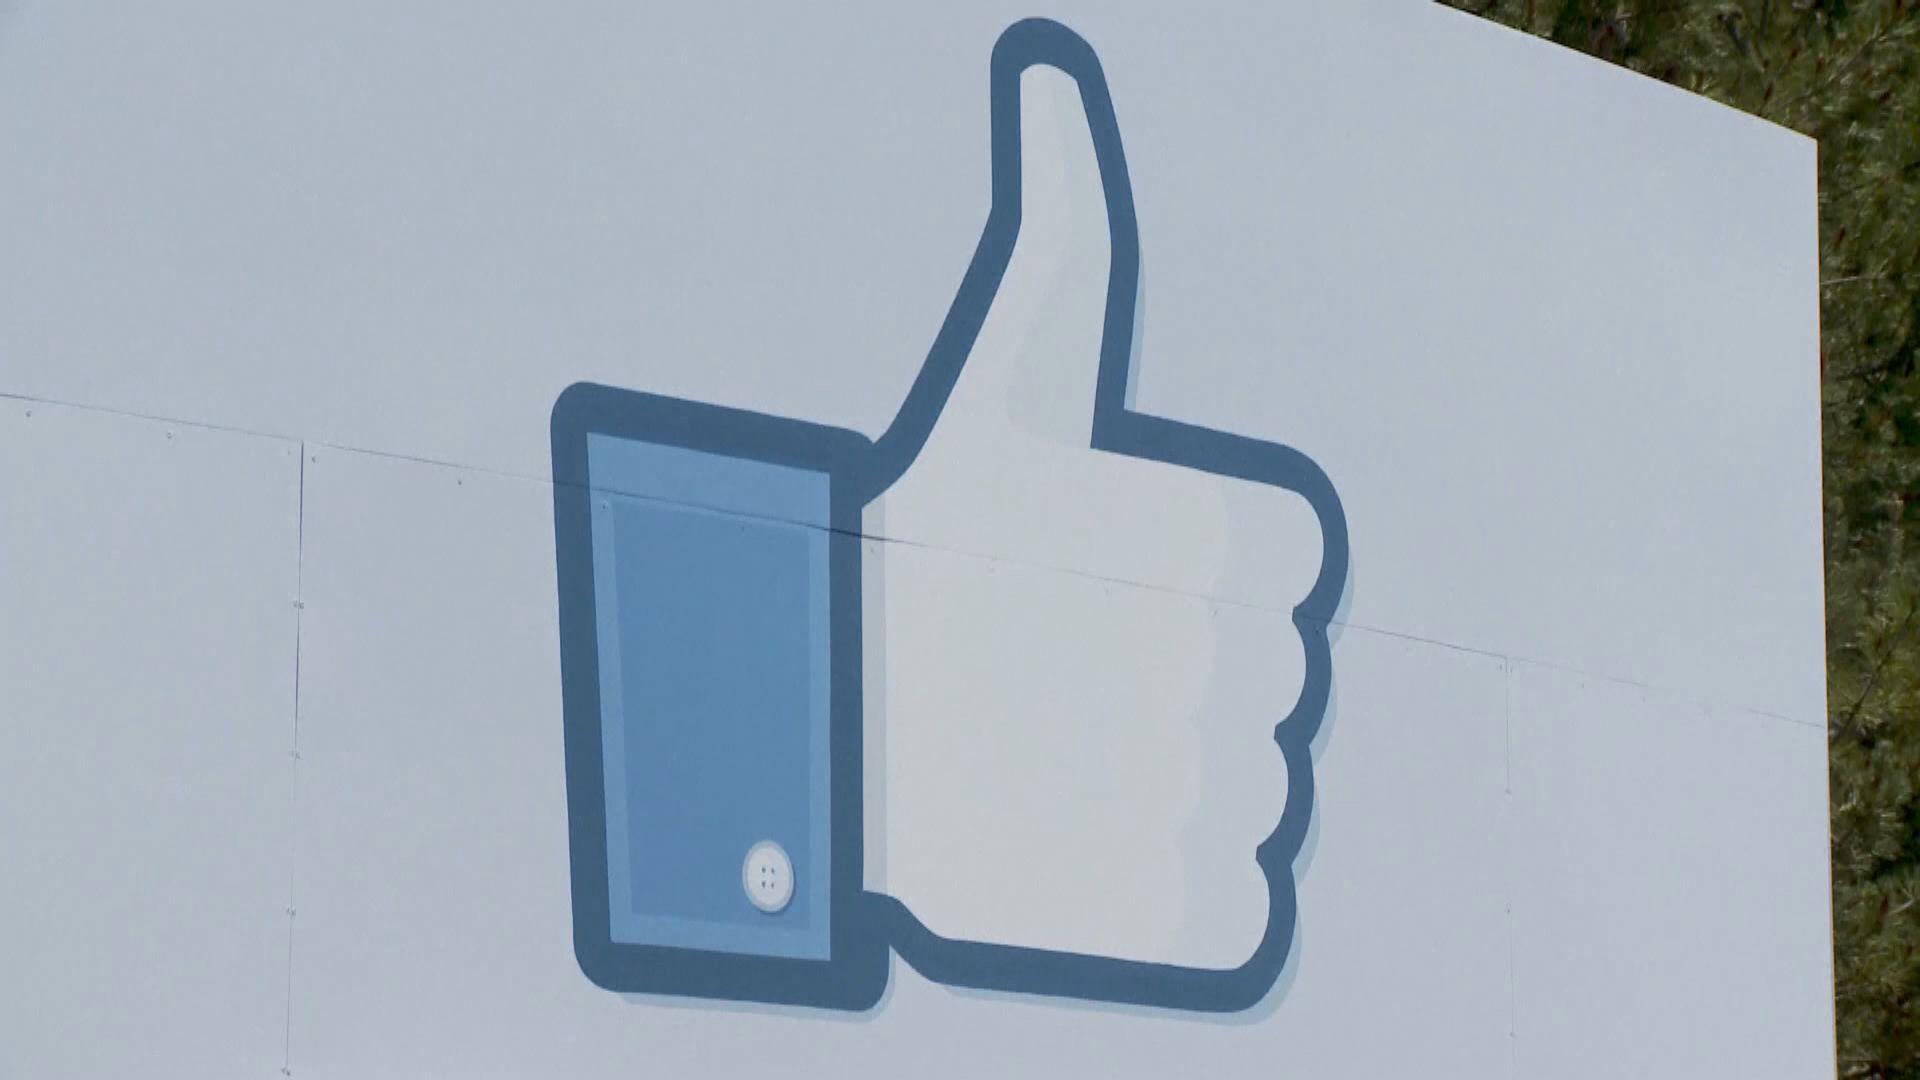 FB政治廣告獲豁免事實查證